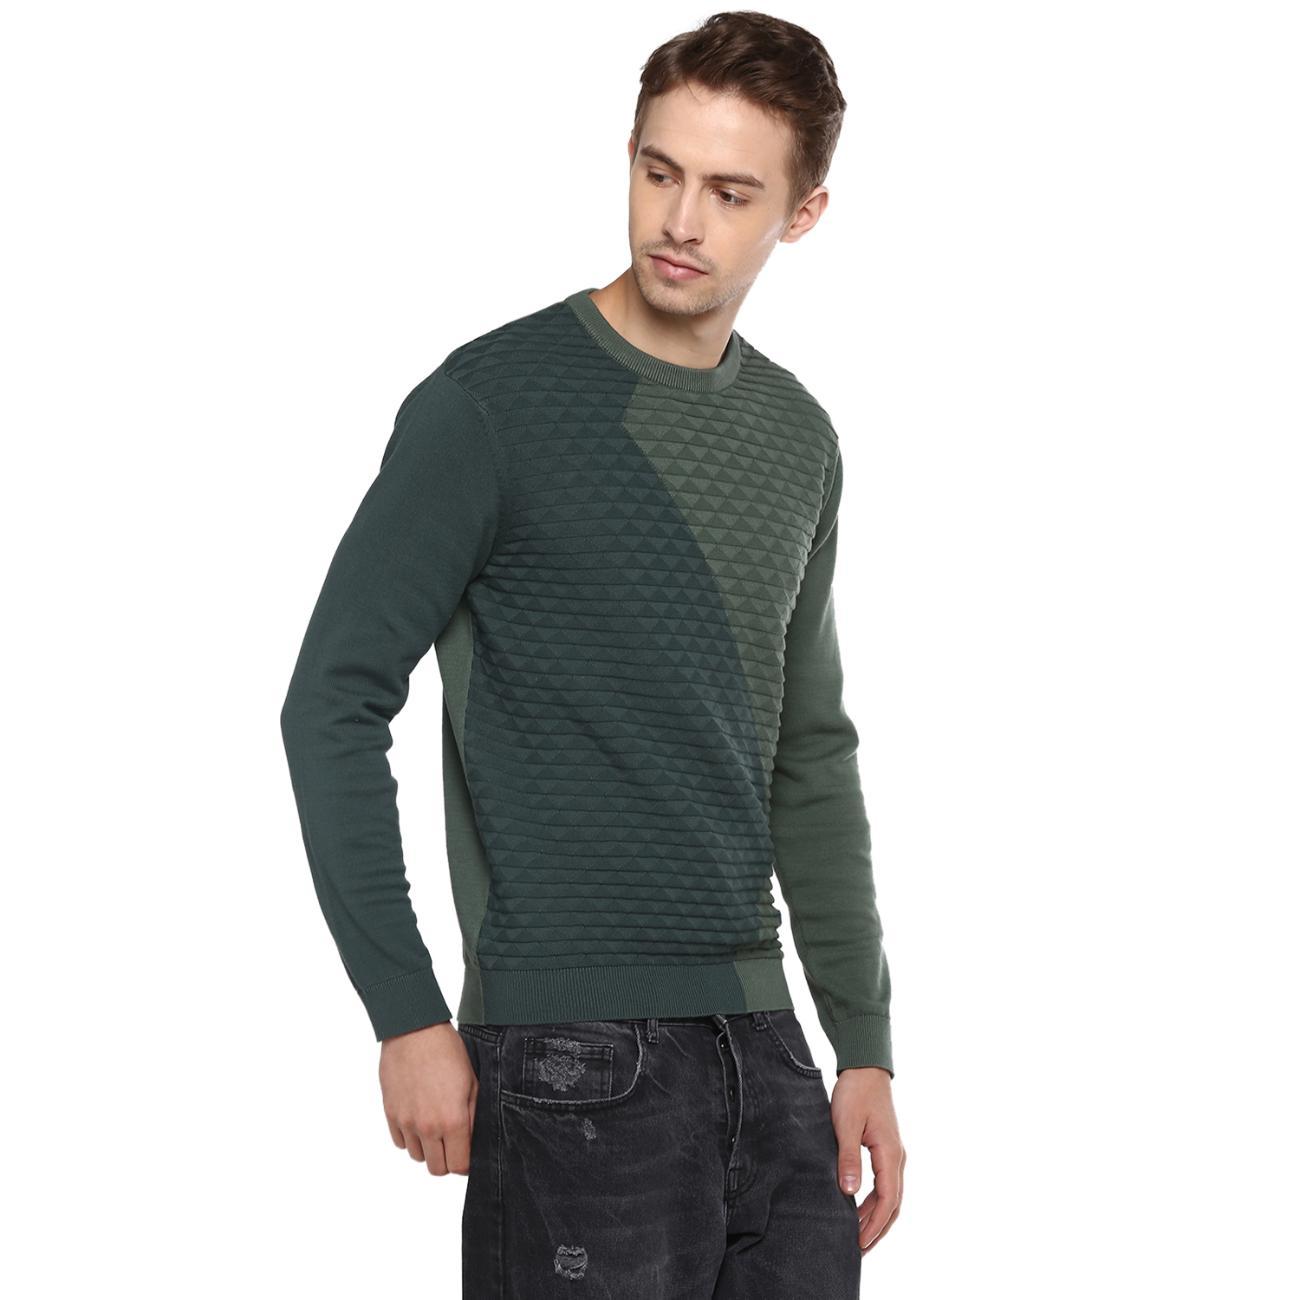 Shop Online Green Colourblocked Sweater for Men